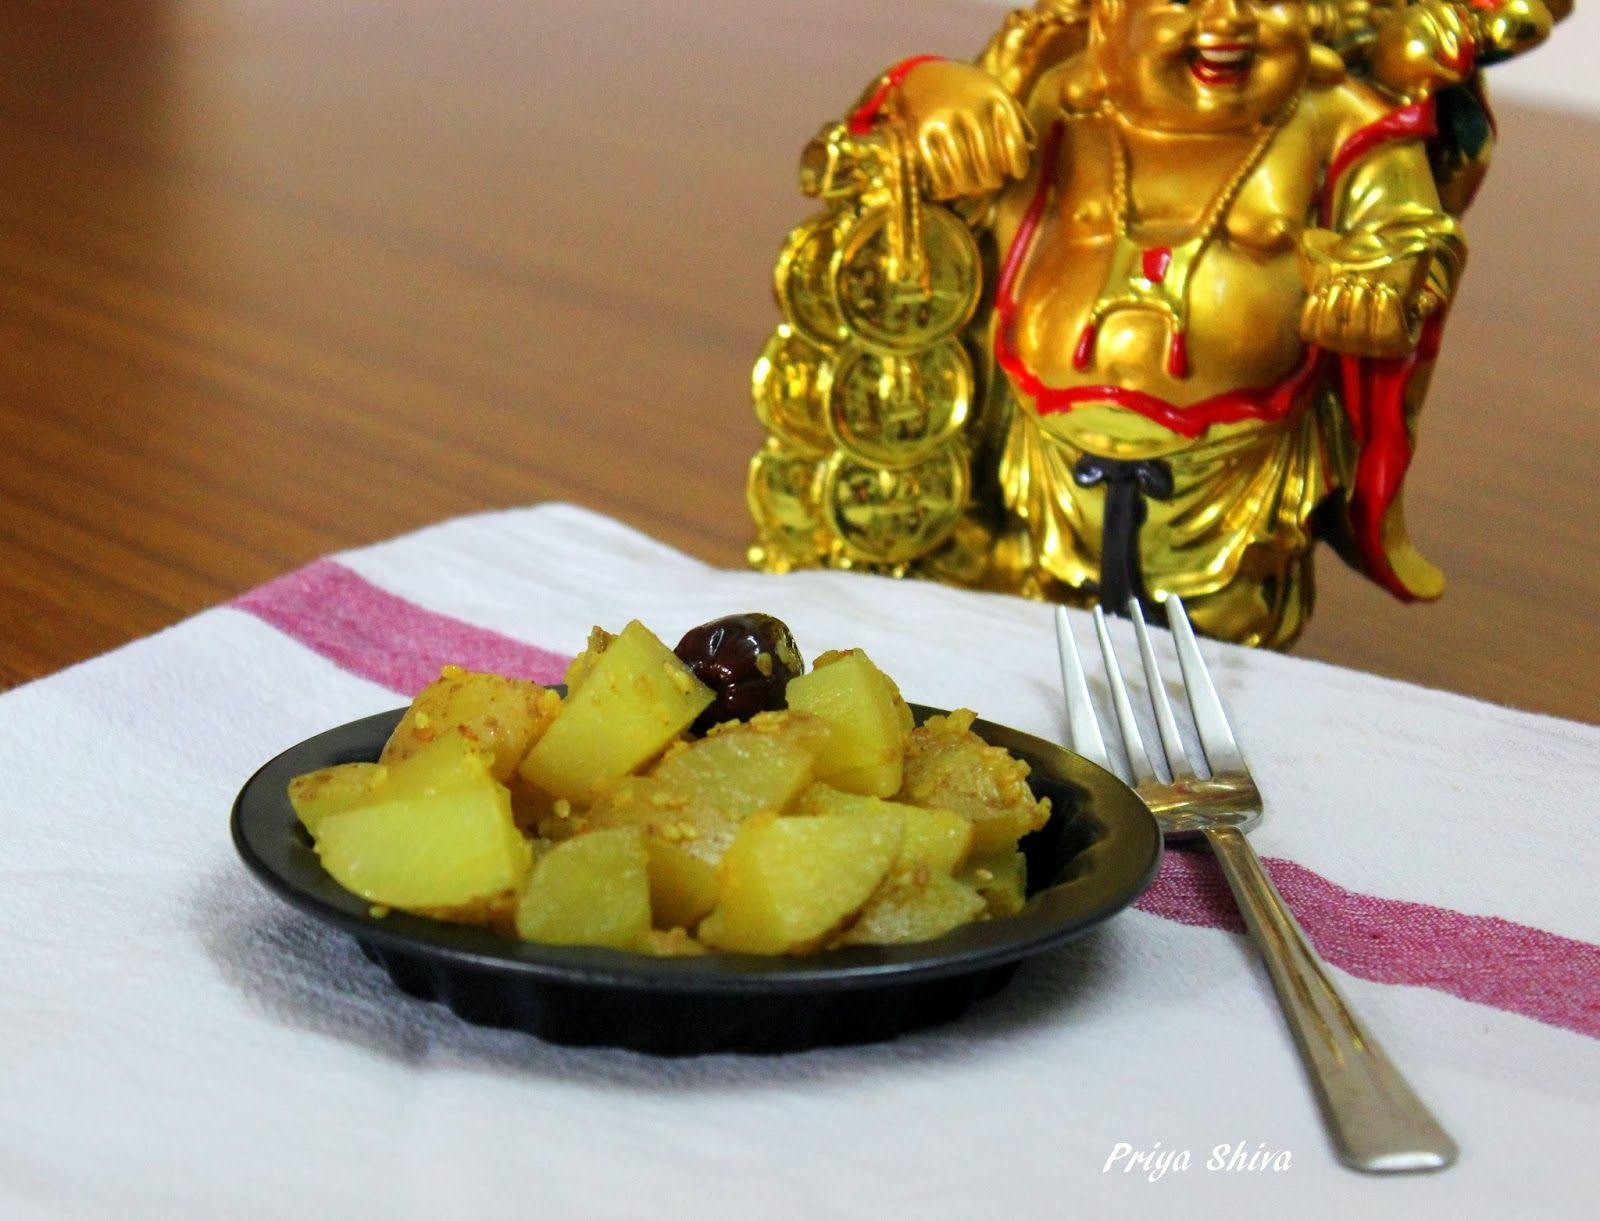 The aromas of my kitchenette : Monk Potatoes